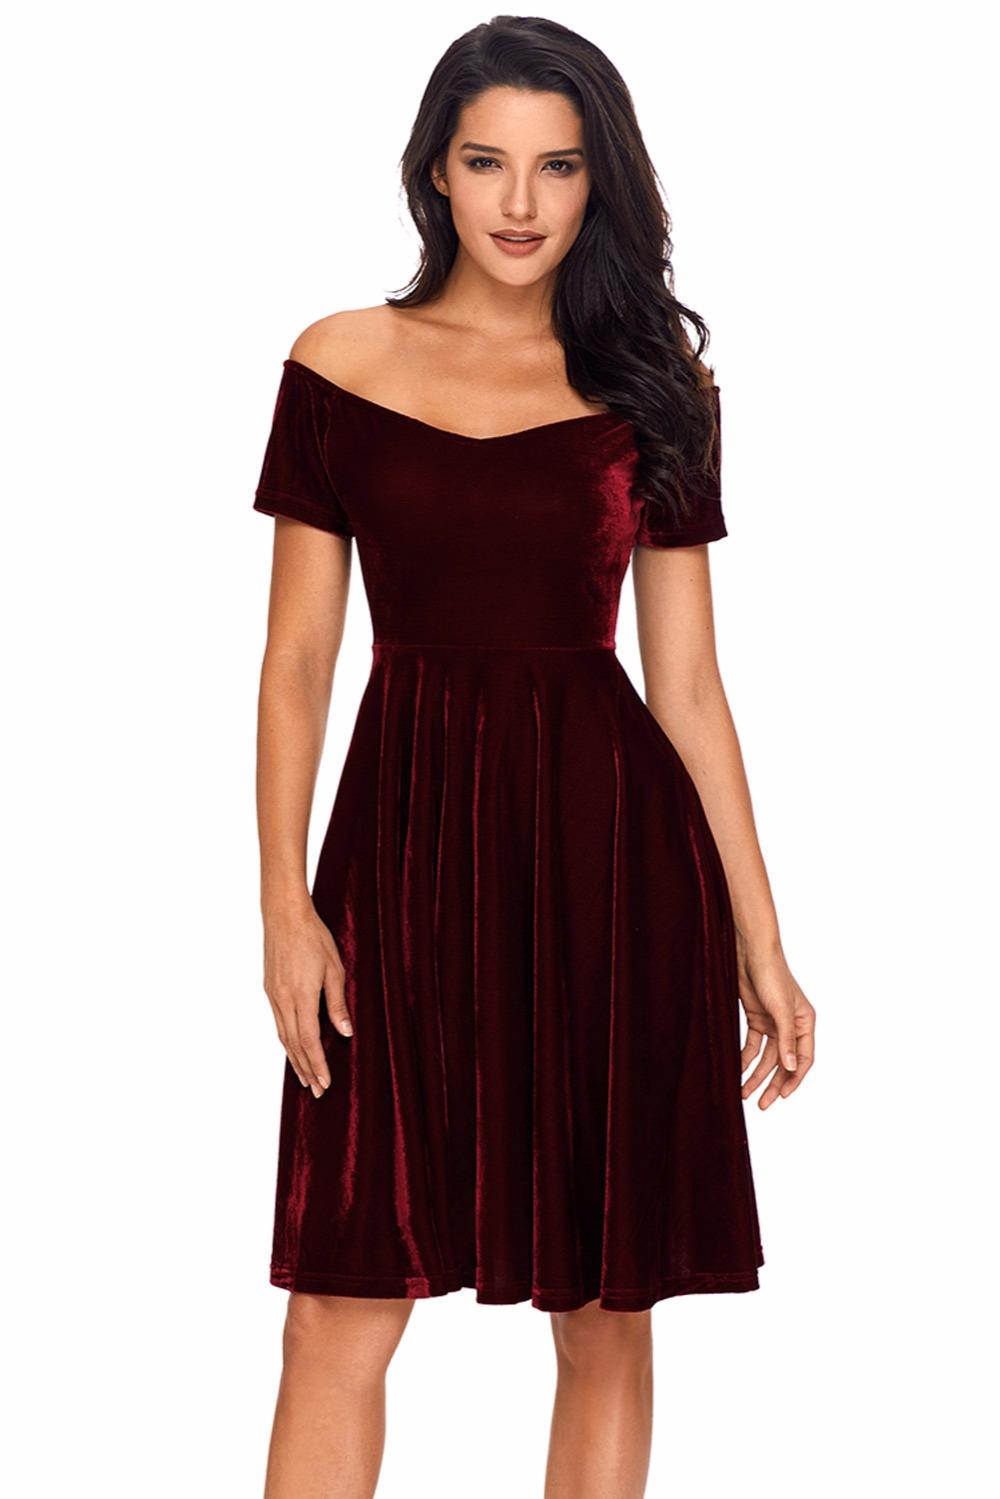 4537c6267a Wholesale-Dear Lover Velvet Dresses 2018 Sexy Womens Party Vestidos de  Festa Off Shoulder Burgundy Pleated Midi Dress Robe Velours LC61861